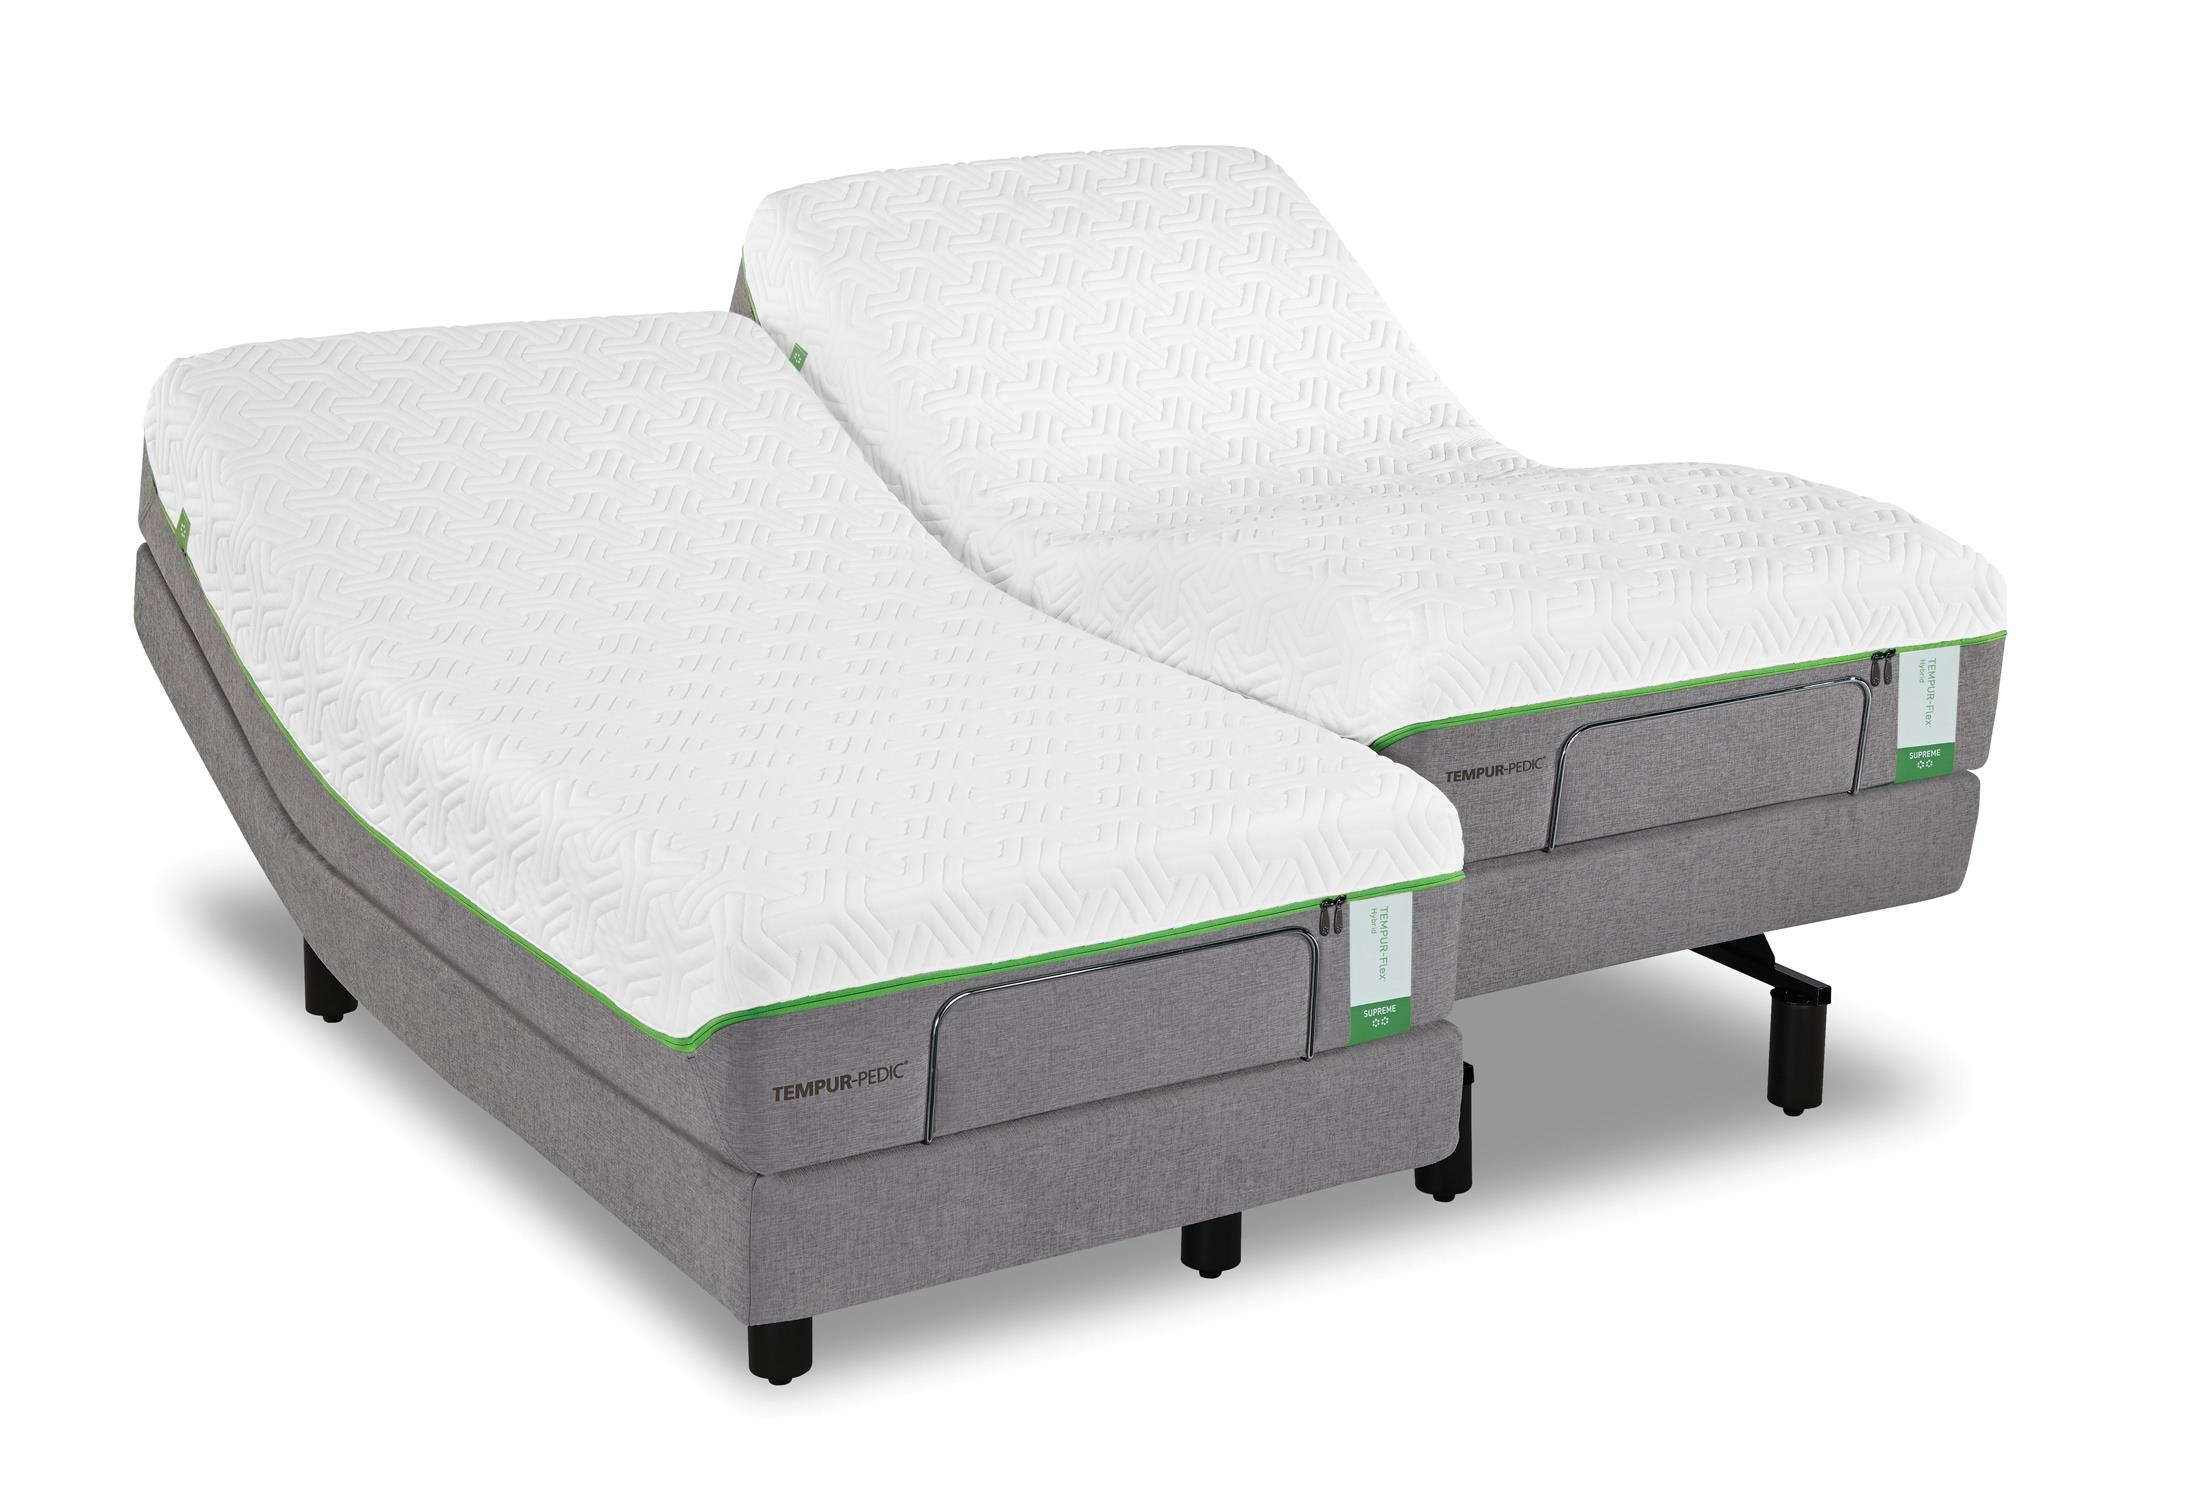 Tempur-Pedic® TEMPUR-Flex Prima Cal King Medium Firm Mattress Set - Item Number: 10115280+2x25289290